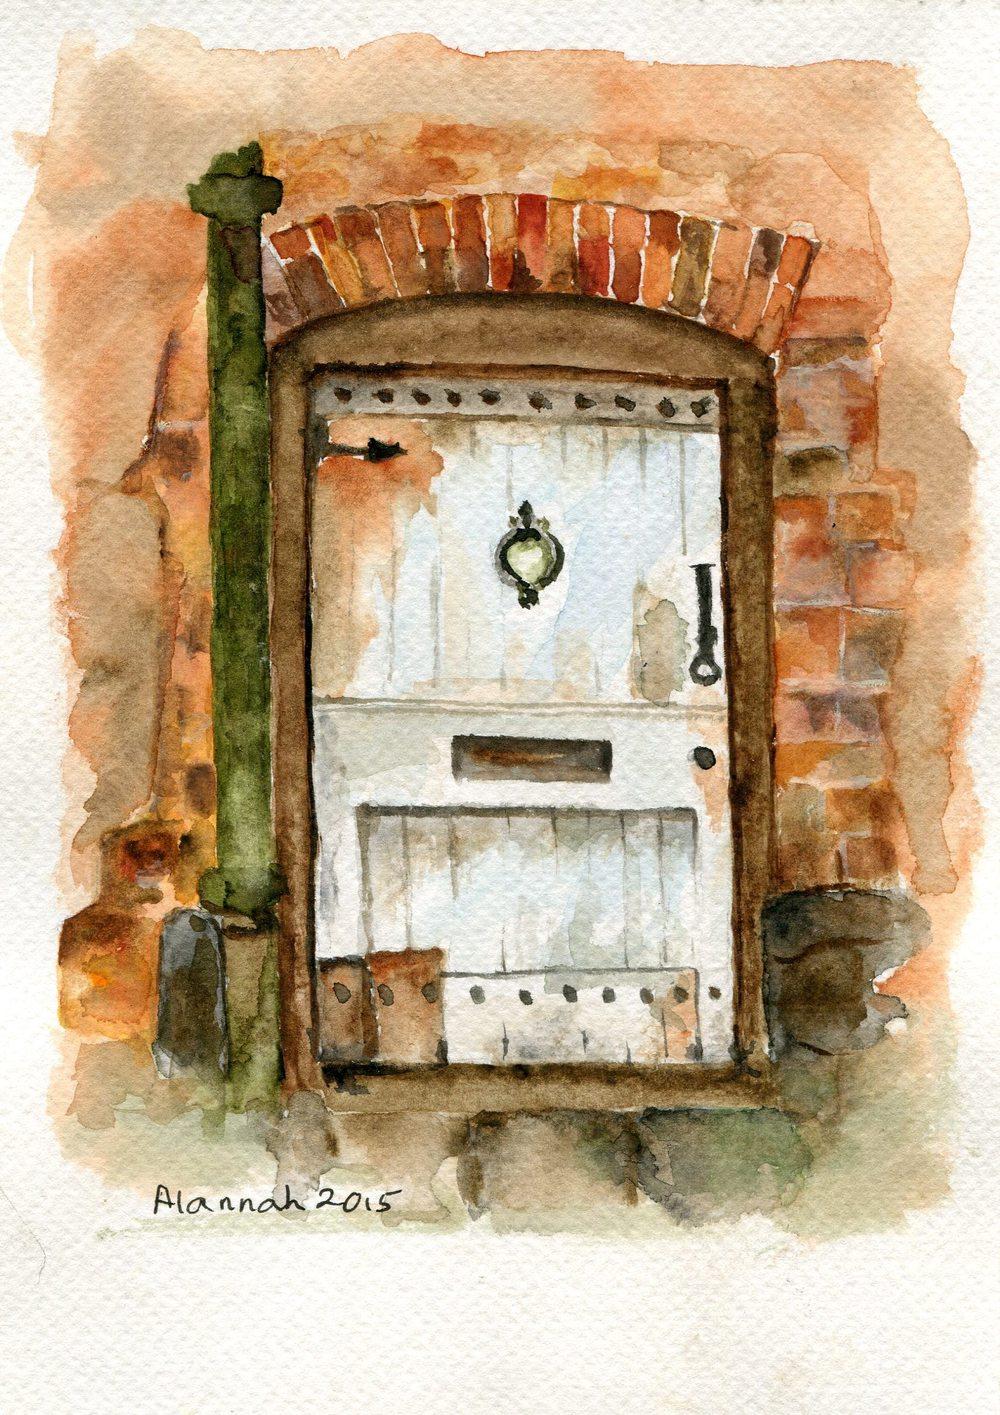 65a Valentine, Alannah - Textured Door, Watercolour.jpg